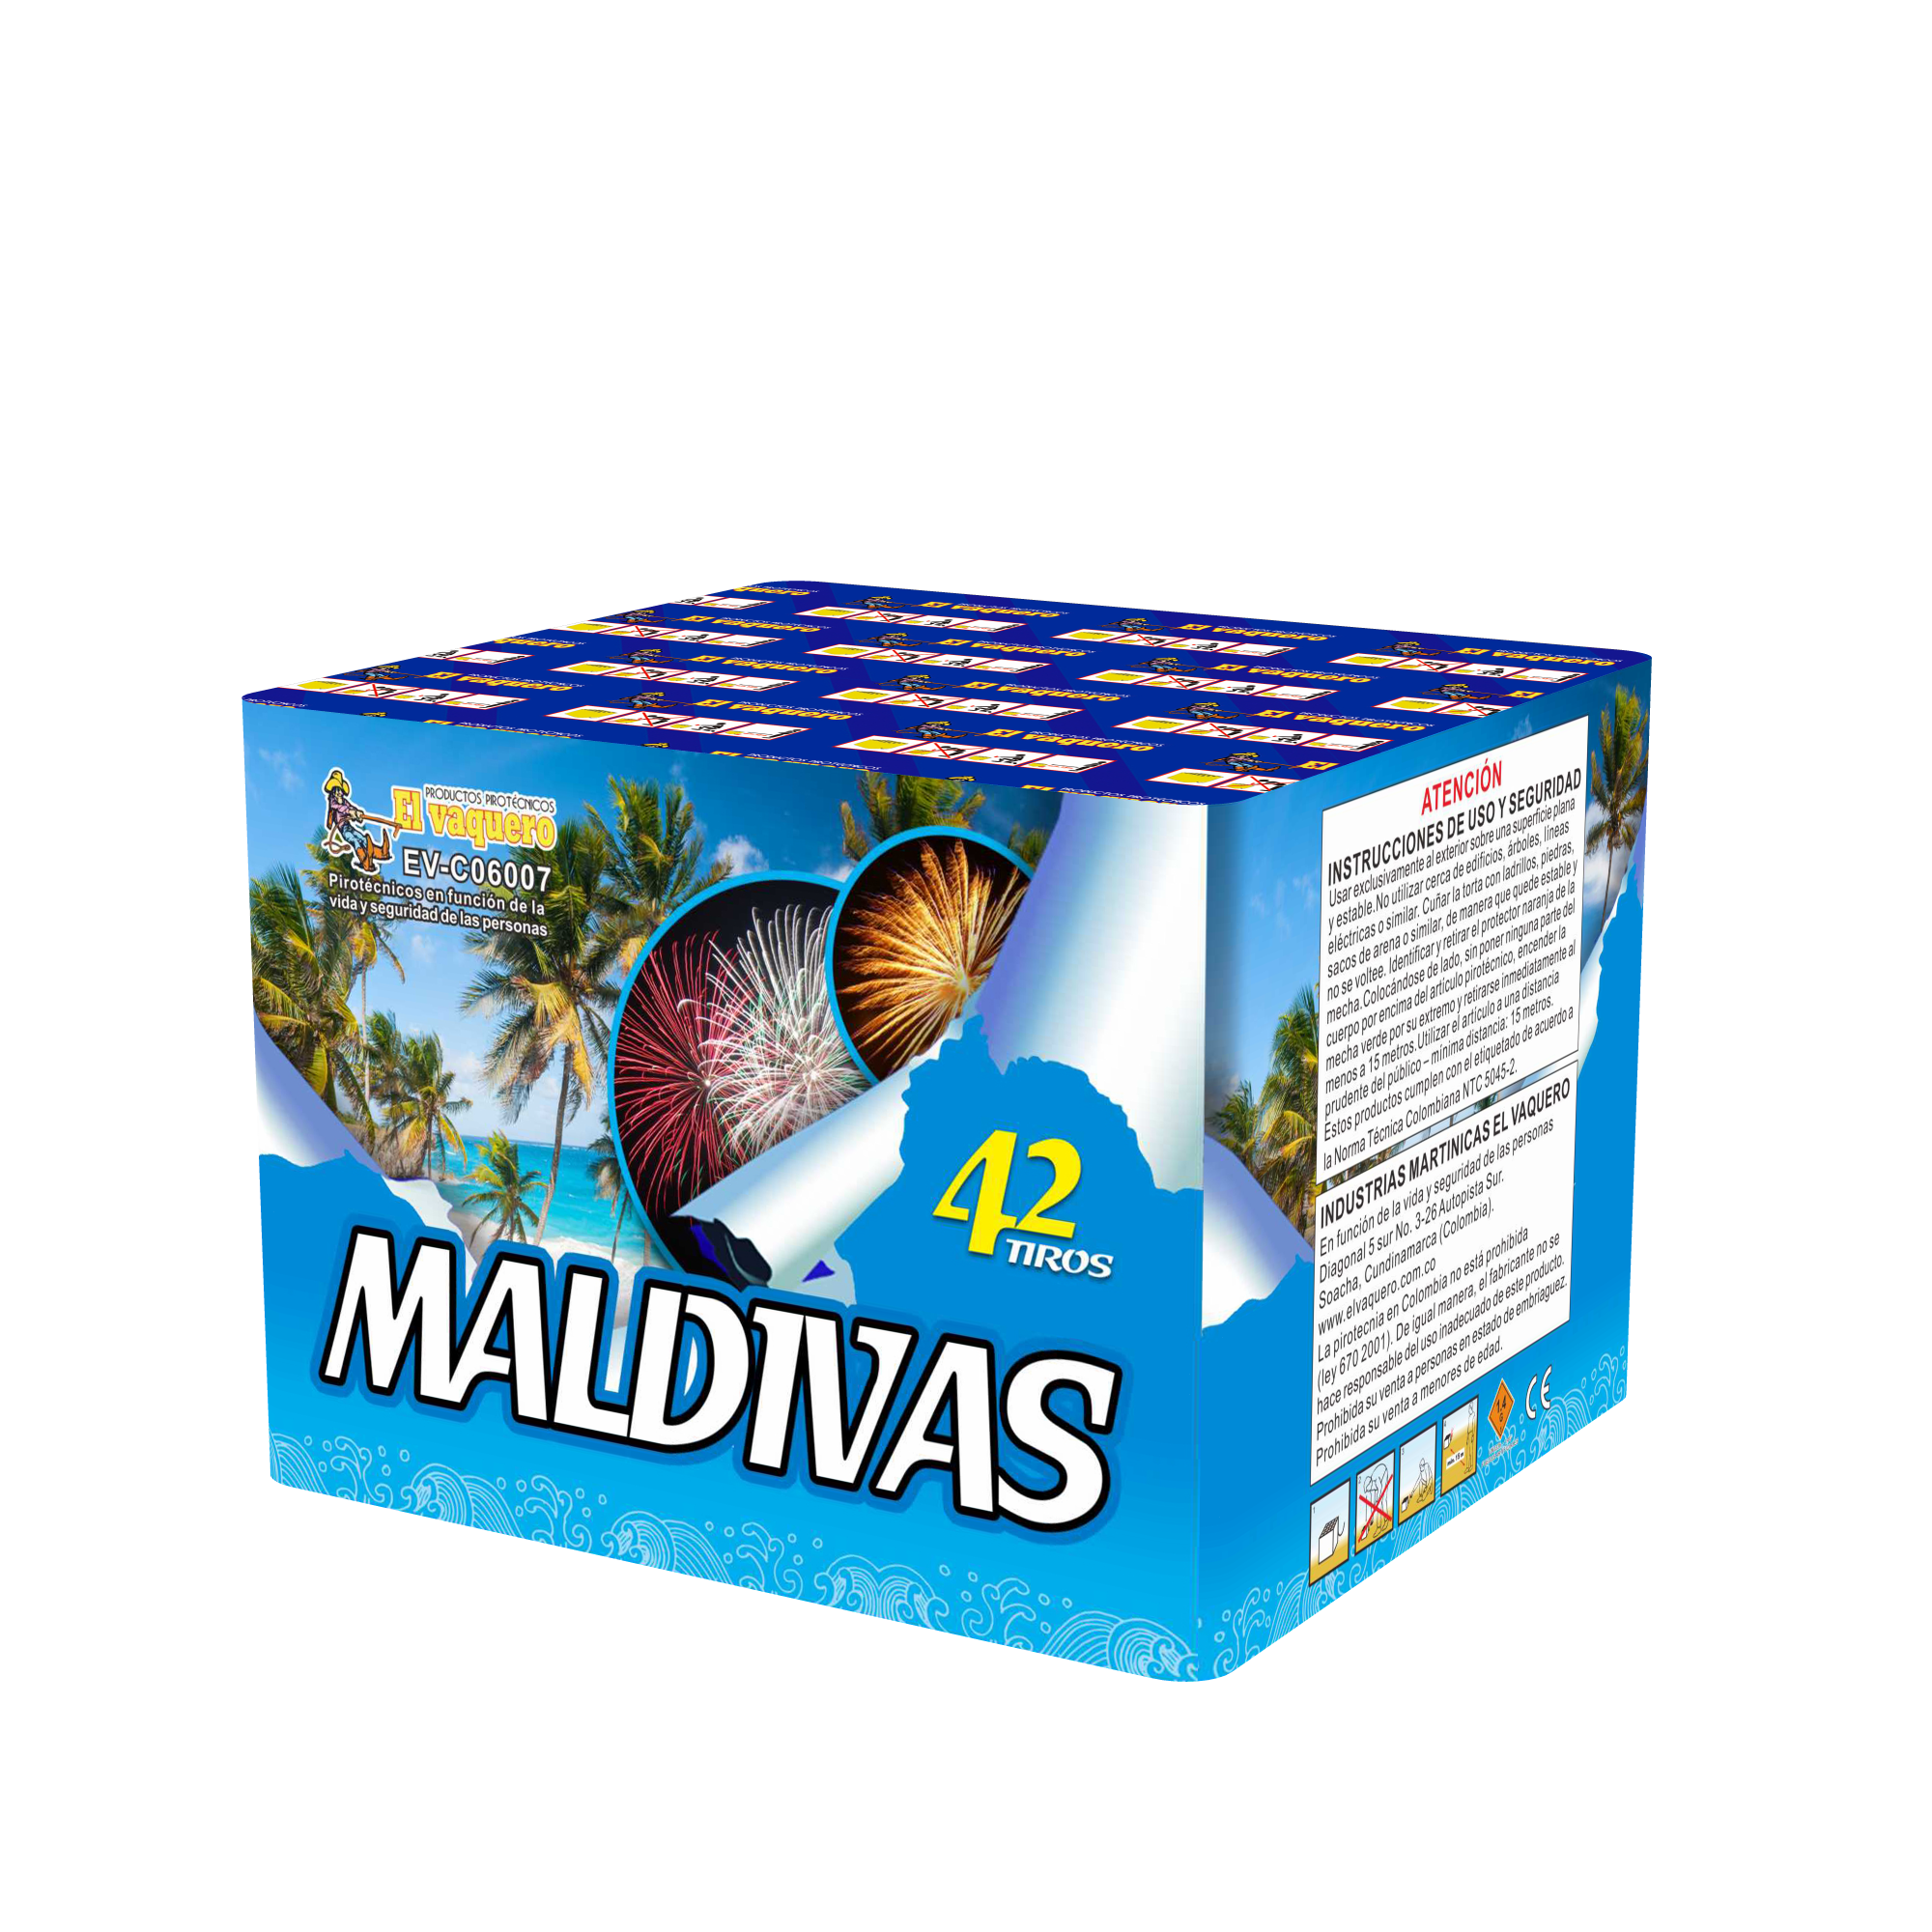 Torta Maldivas 42 tiros 0.8